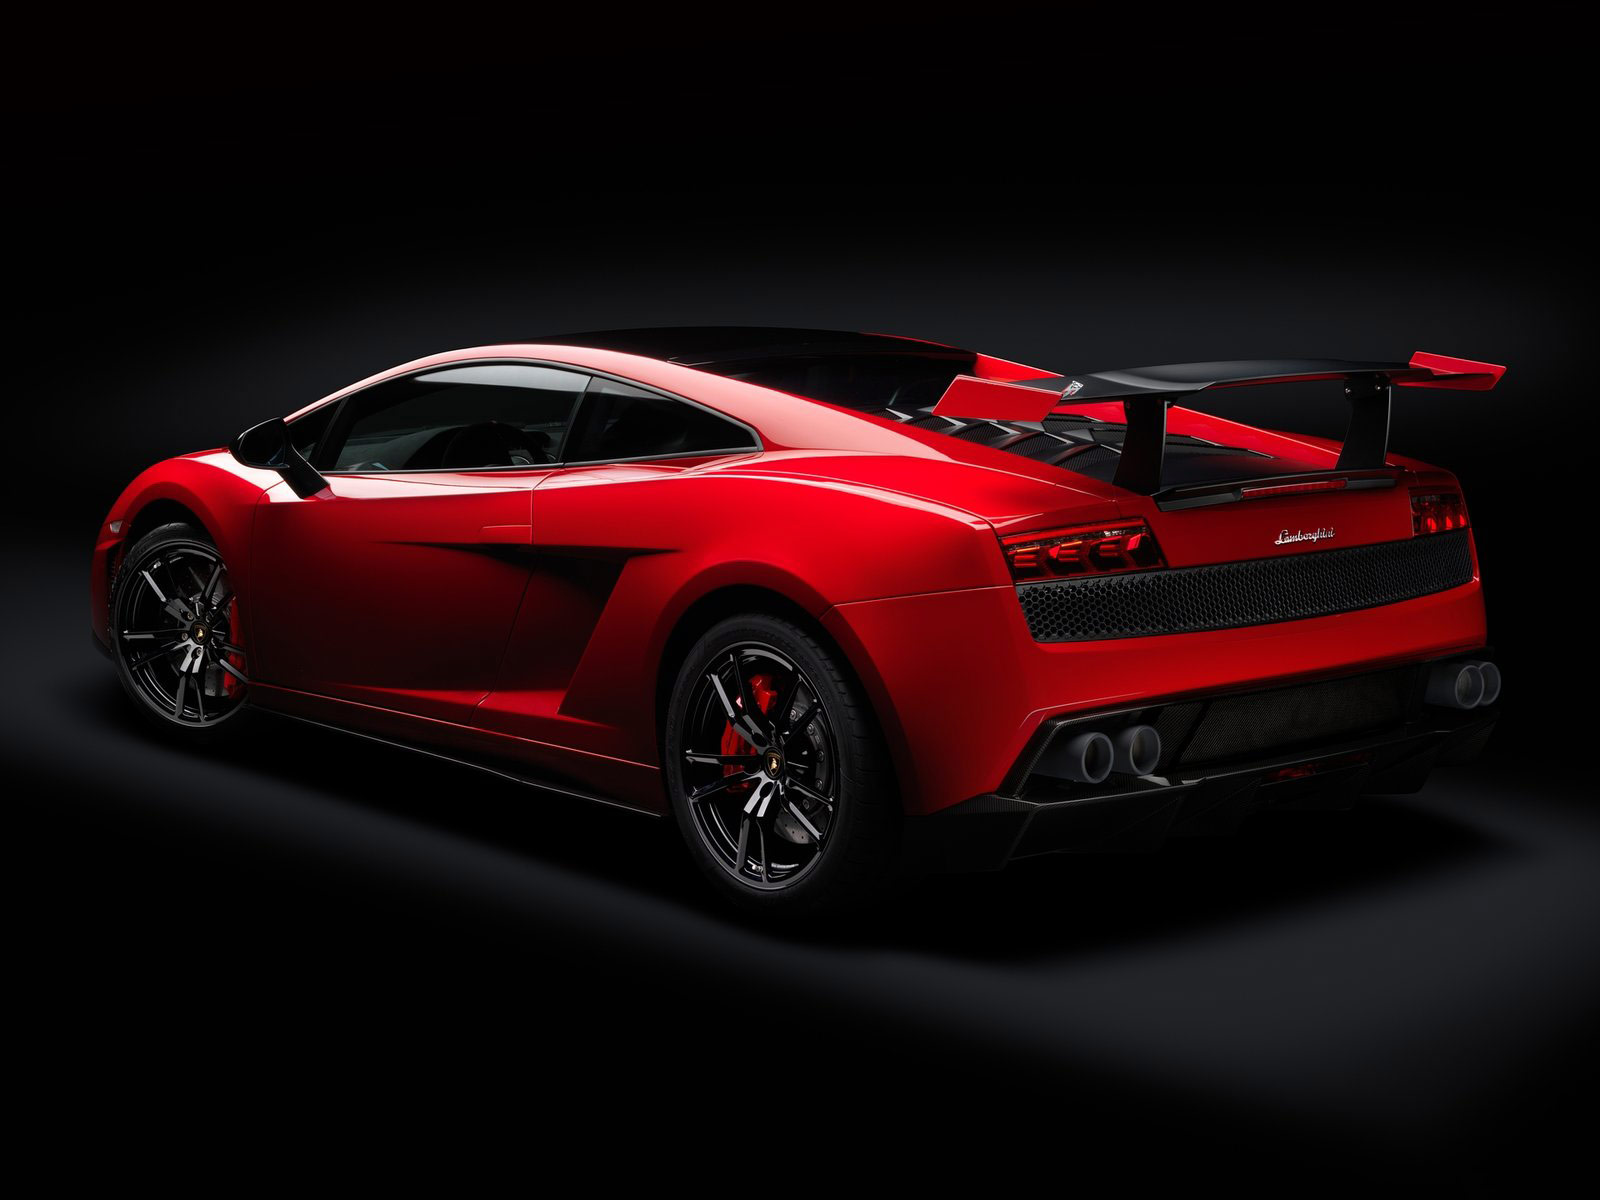 2012 Gallardo Lp570 4 Super Trofeo Stradale Lamborghini